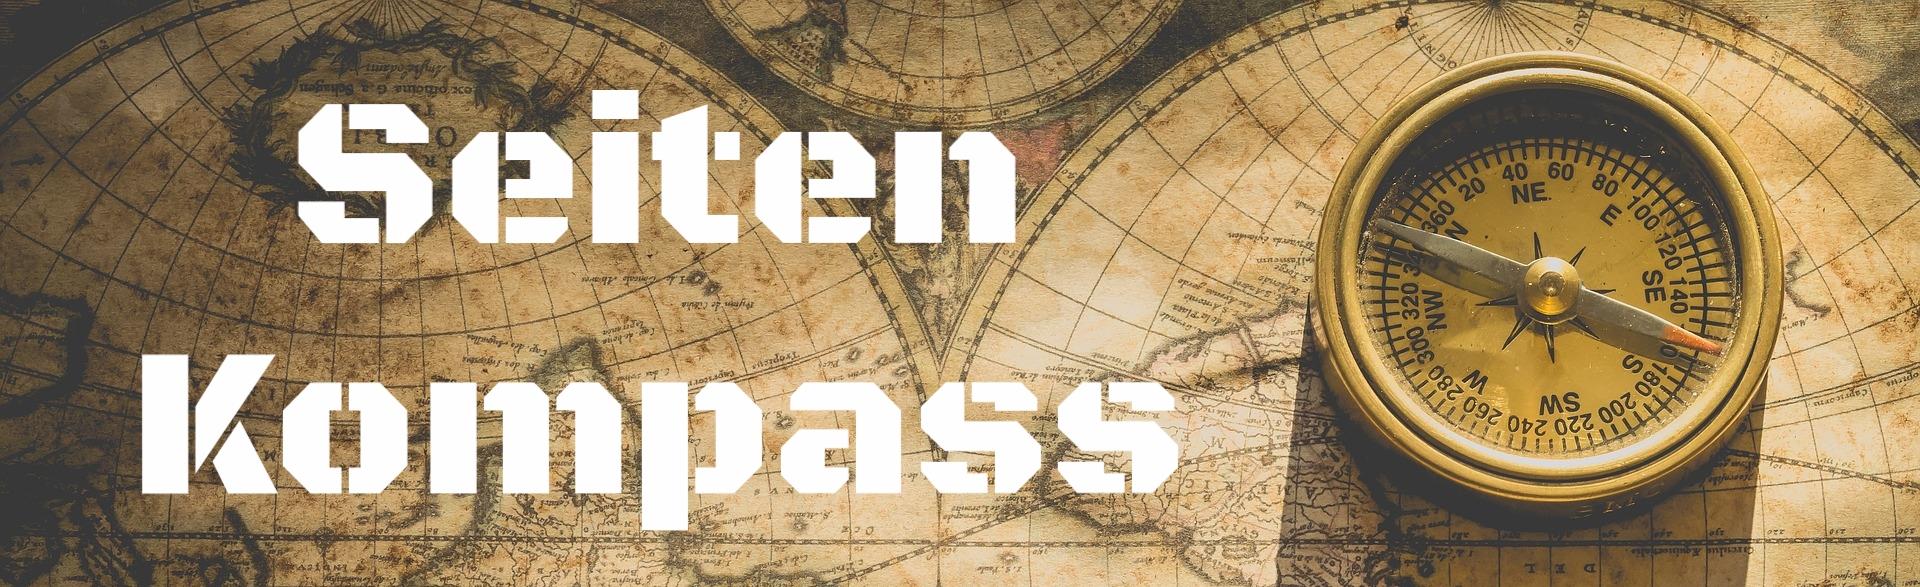 Montreal Reisetipps Seiten Kompass